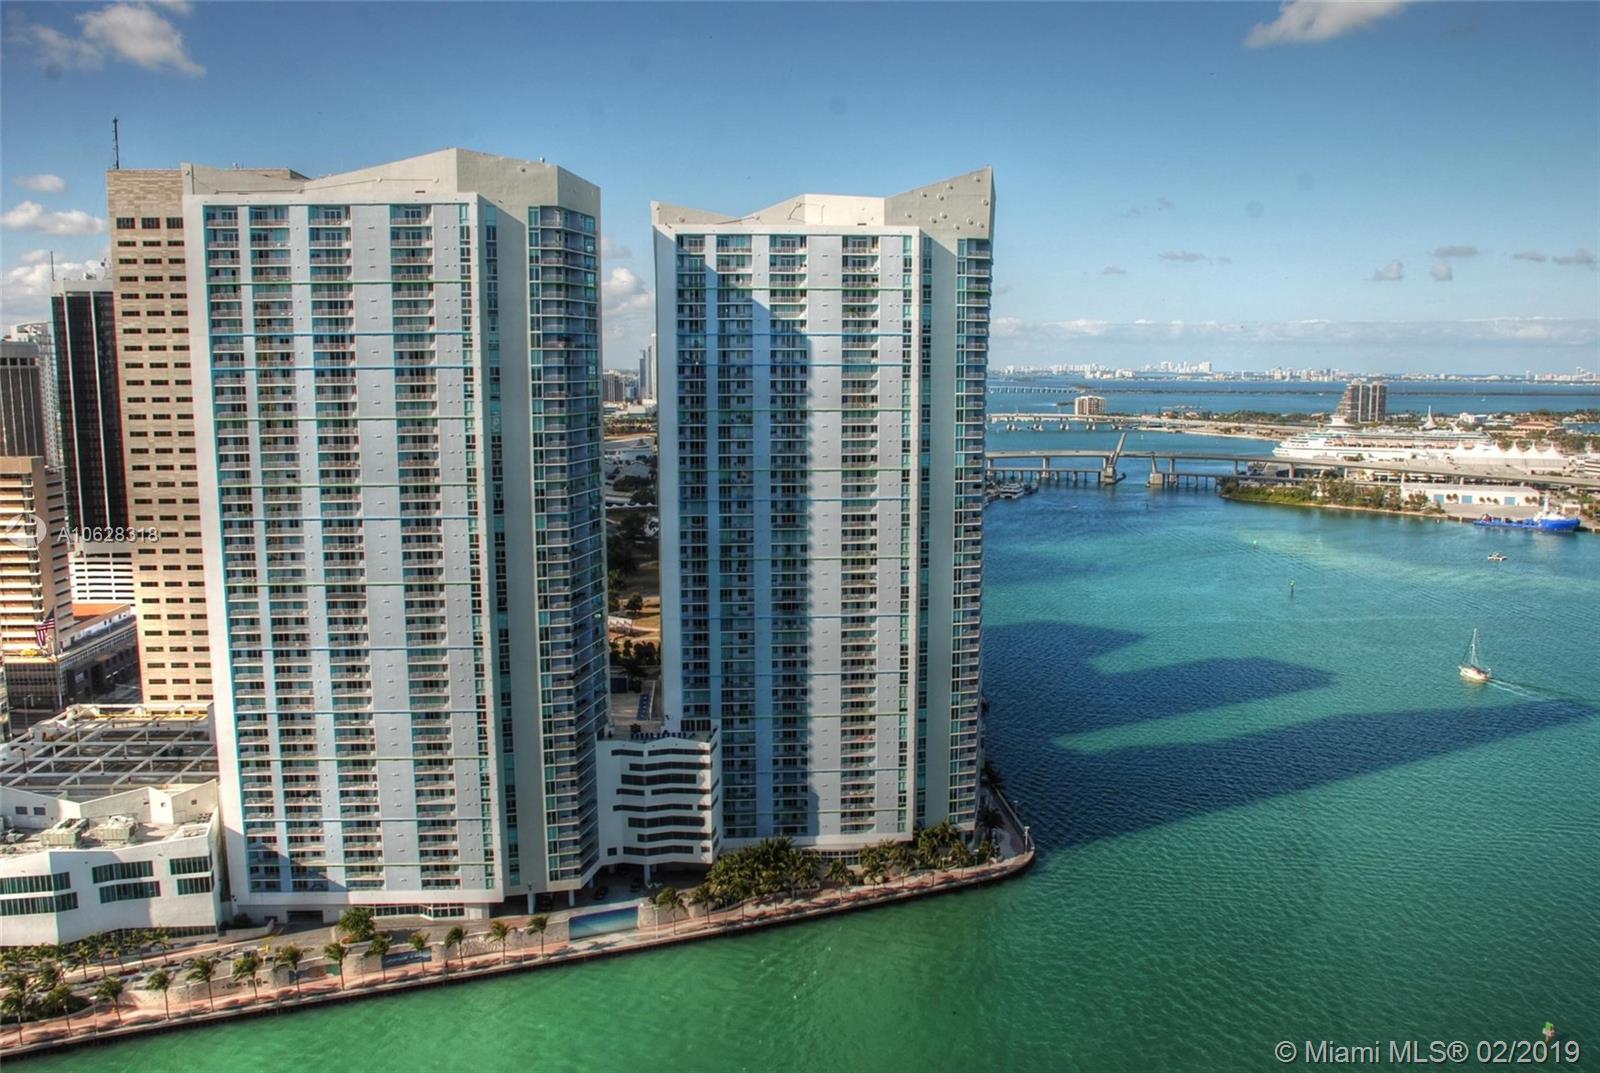 325 S Biscayne Blvd #323, Miami FL 33131